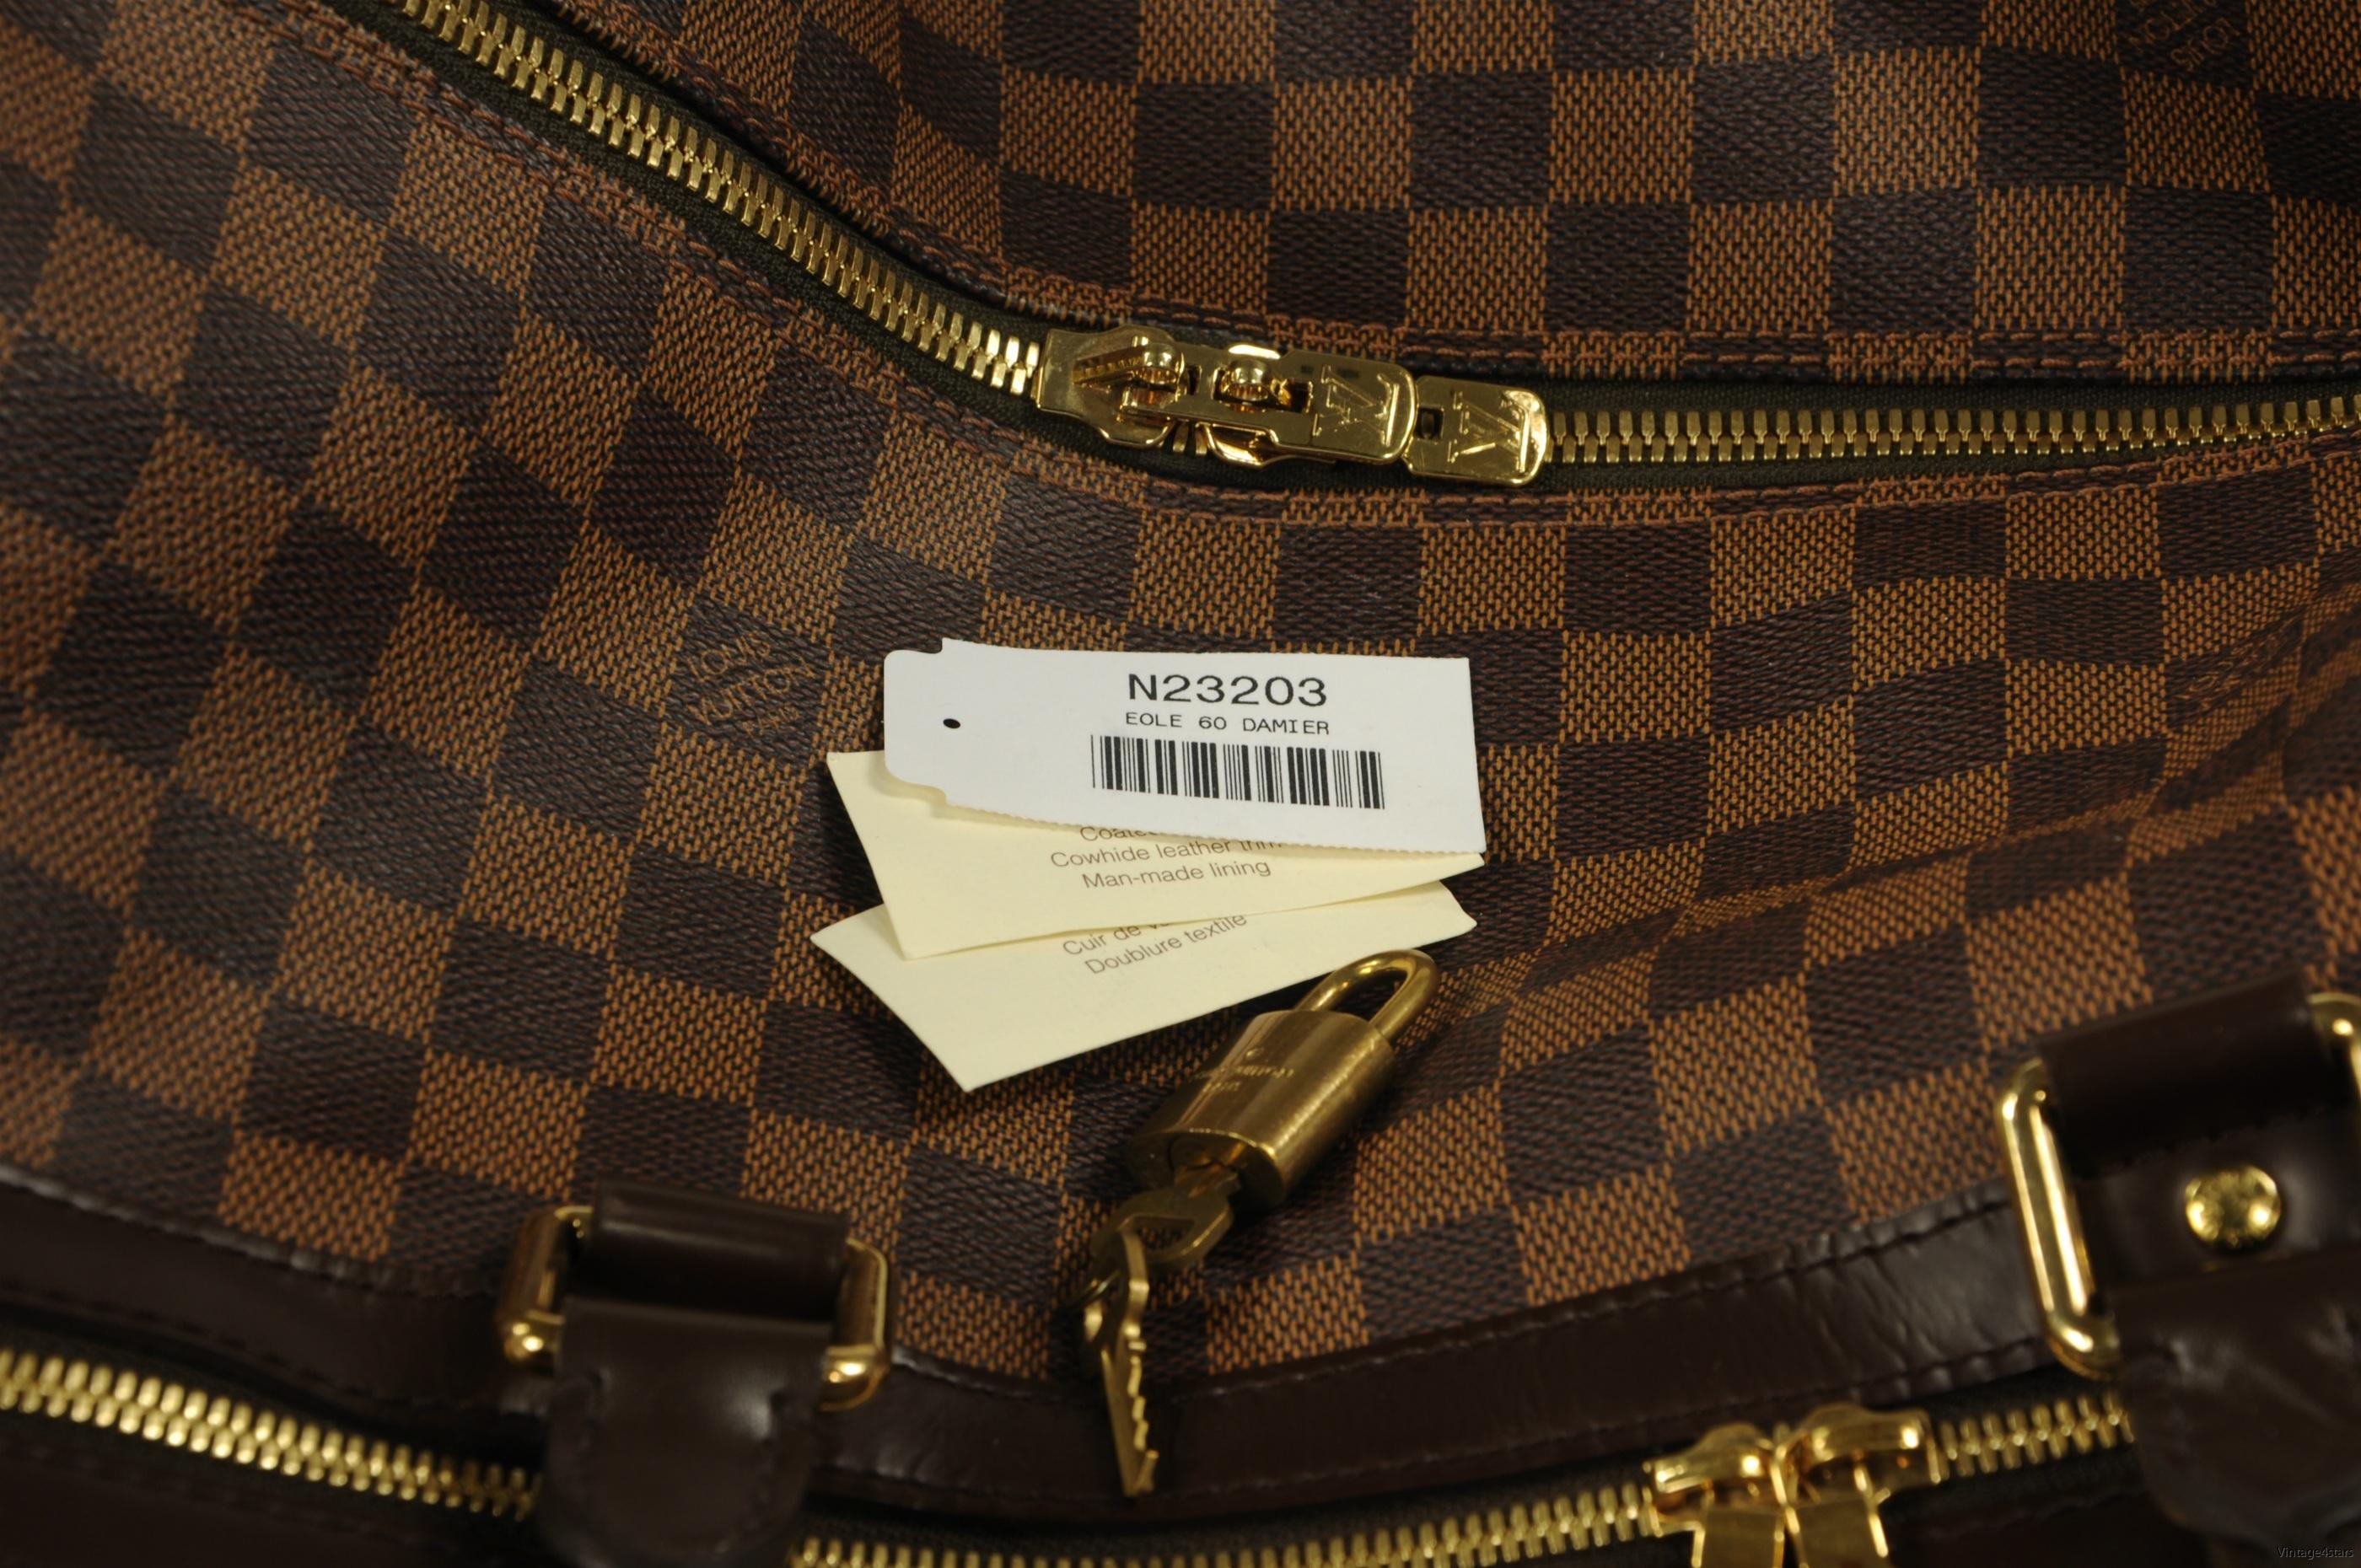 Louis Vuitton Eole 60 Damier Ebene 19